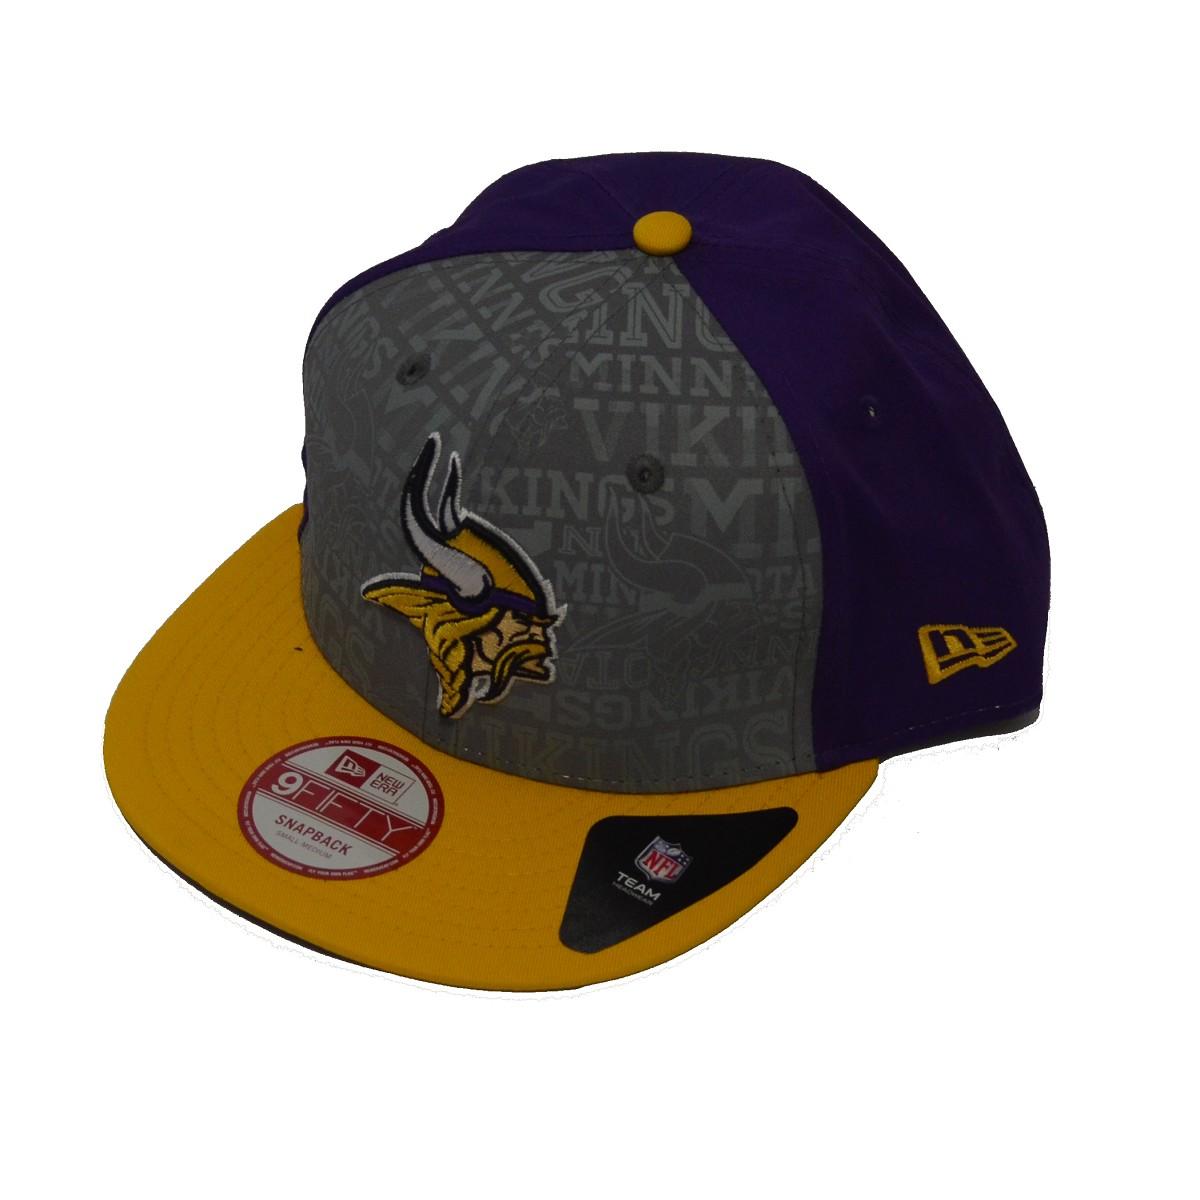 Cappello New Era 9fifty Draft 14 Minnesota Vikings 9fifty